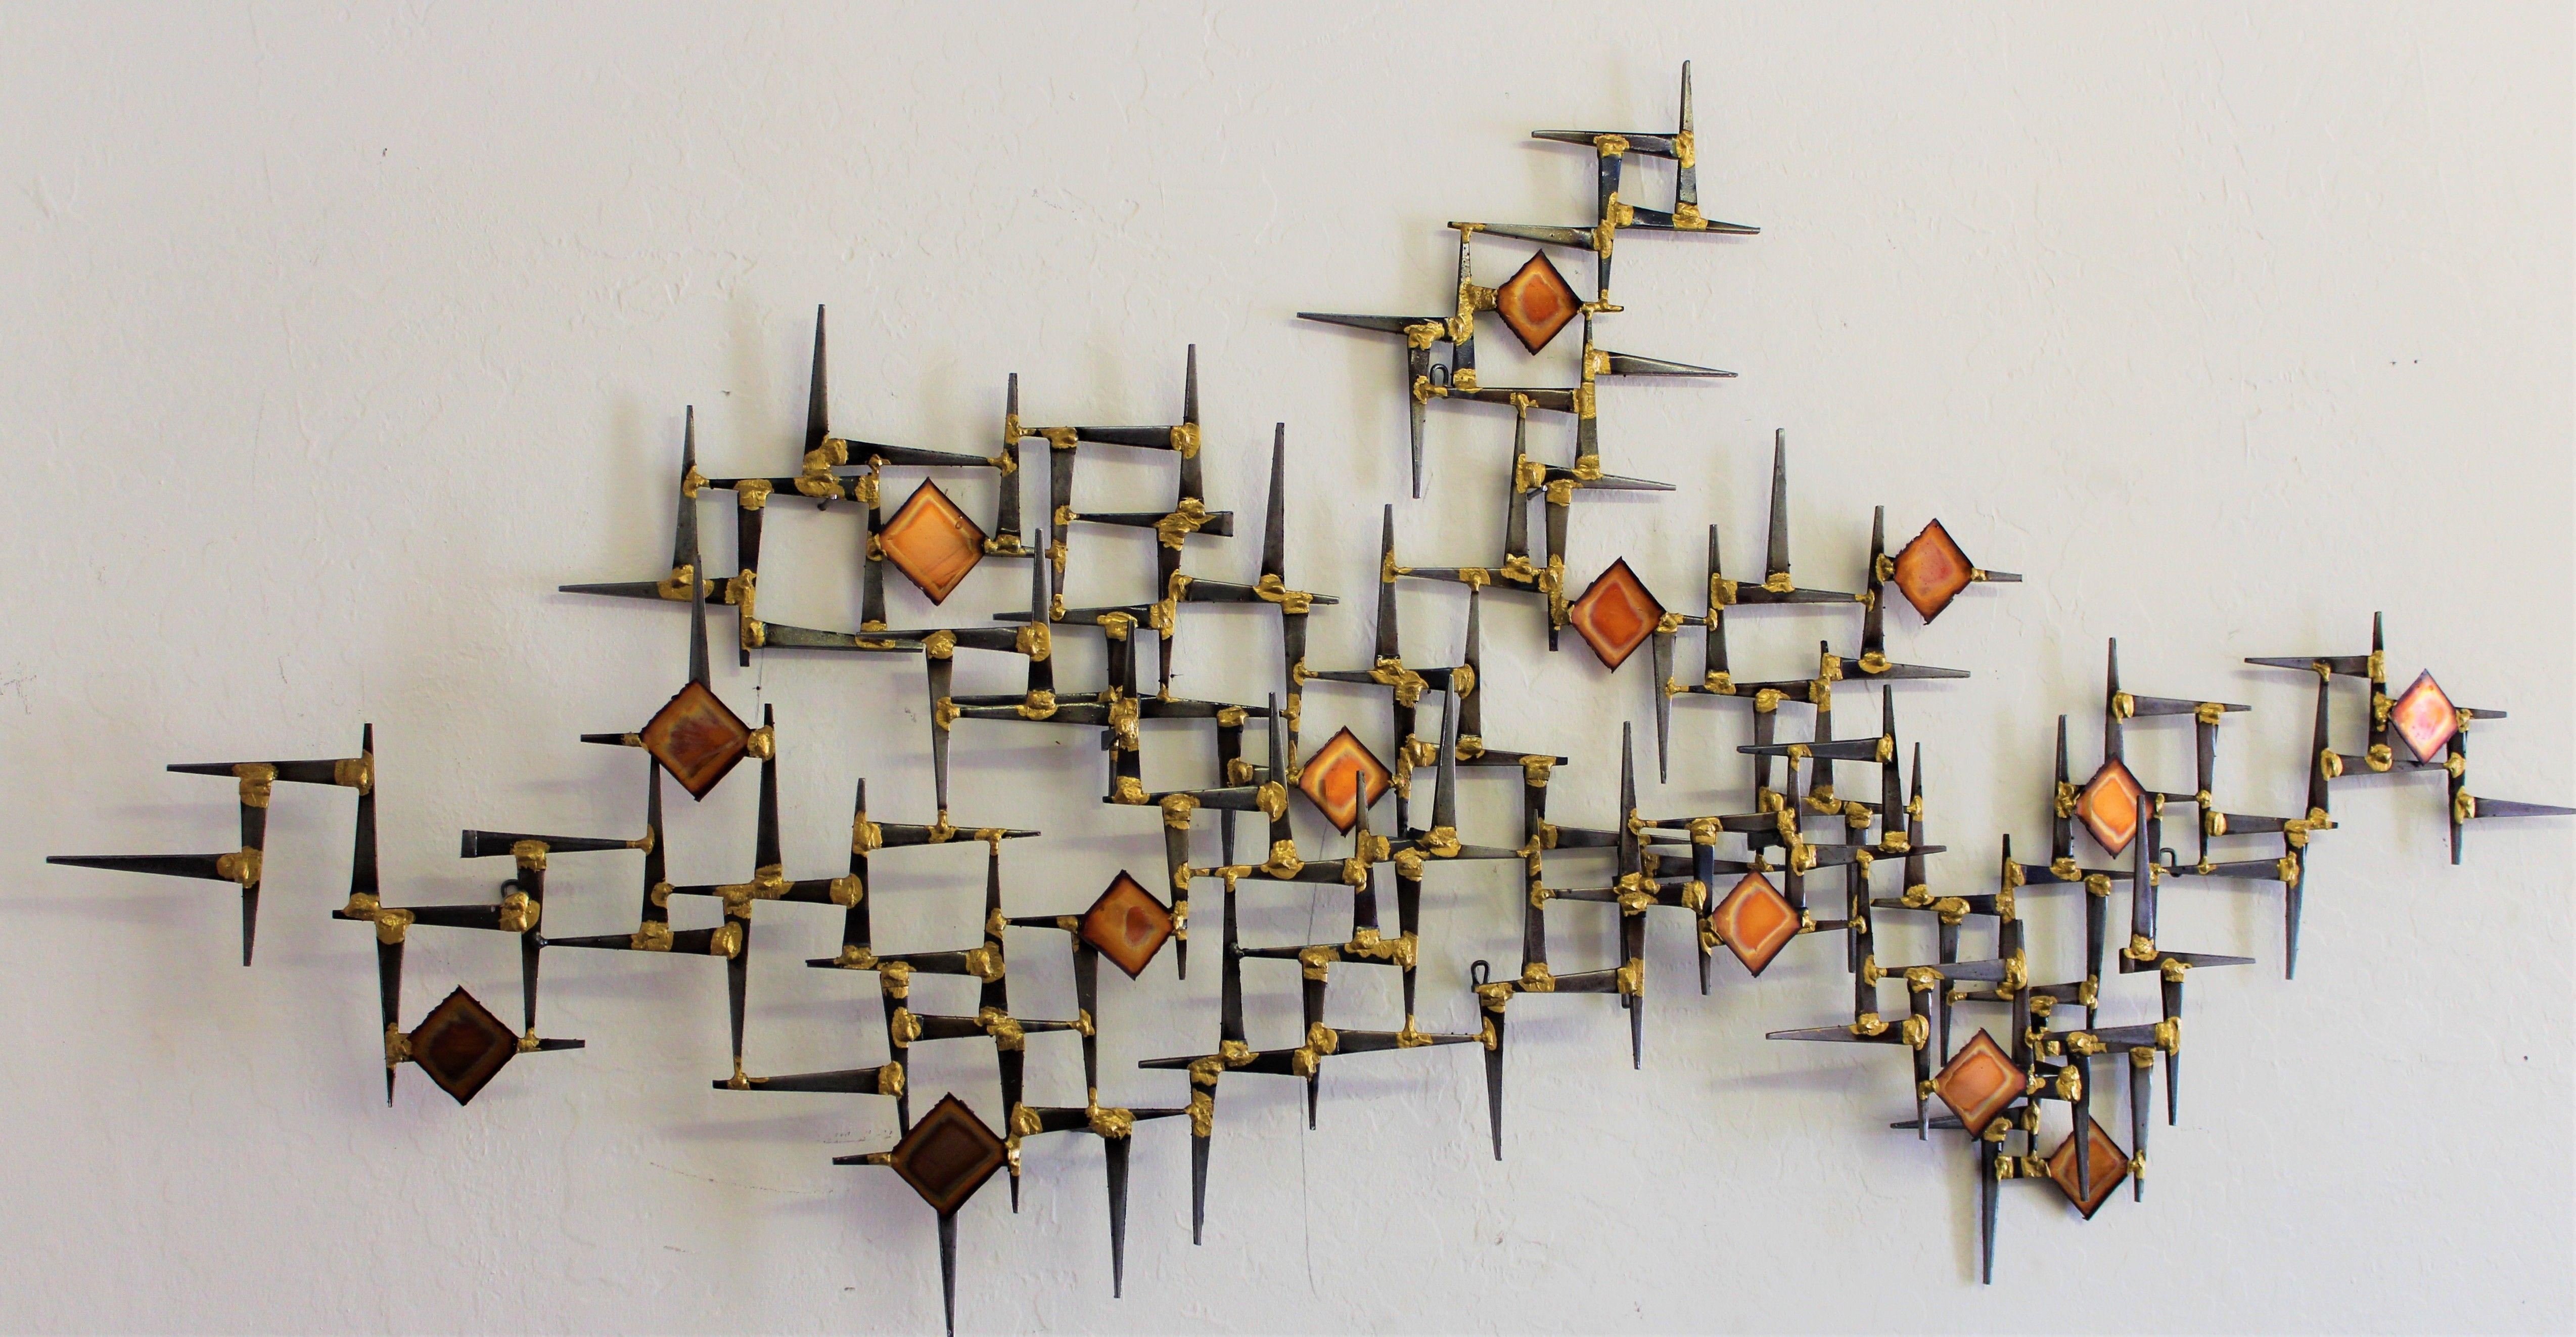 Steel Nail Sculpture Created By Artist Corey Ellis Mid Century Modern Wall Sculpture Created By Artis Modern Wall Sculptures Wall Sculptures Wall Sculpture Art